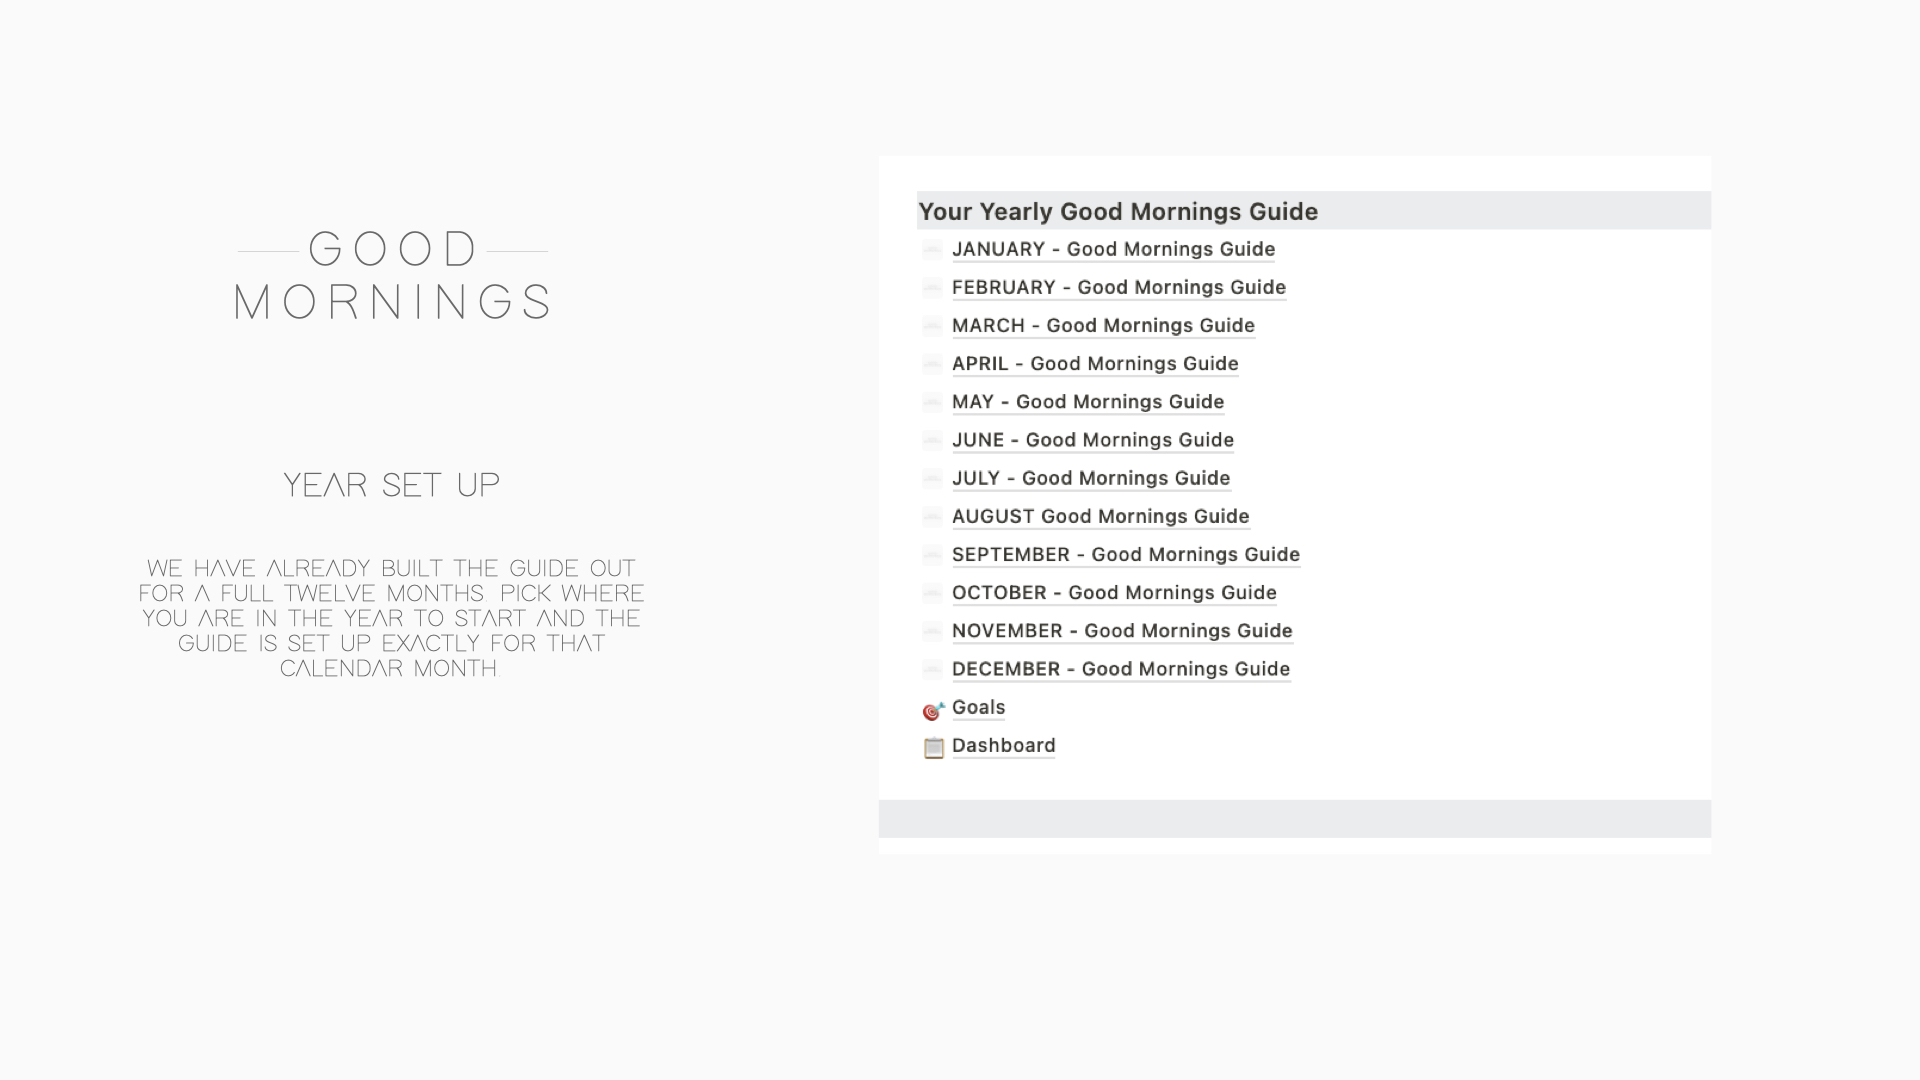 The Good Mornings Guide